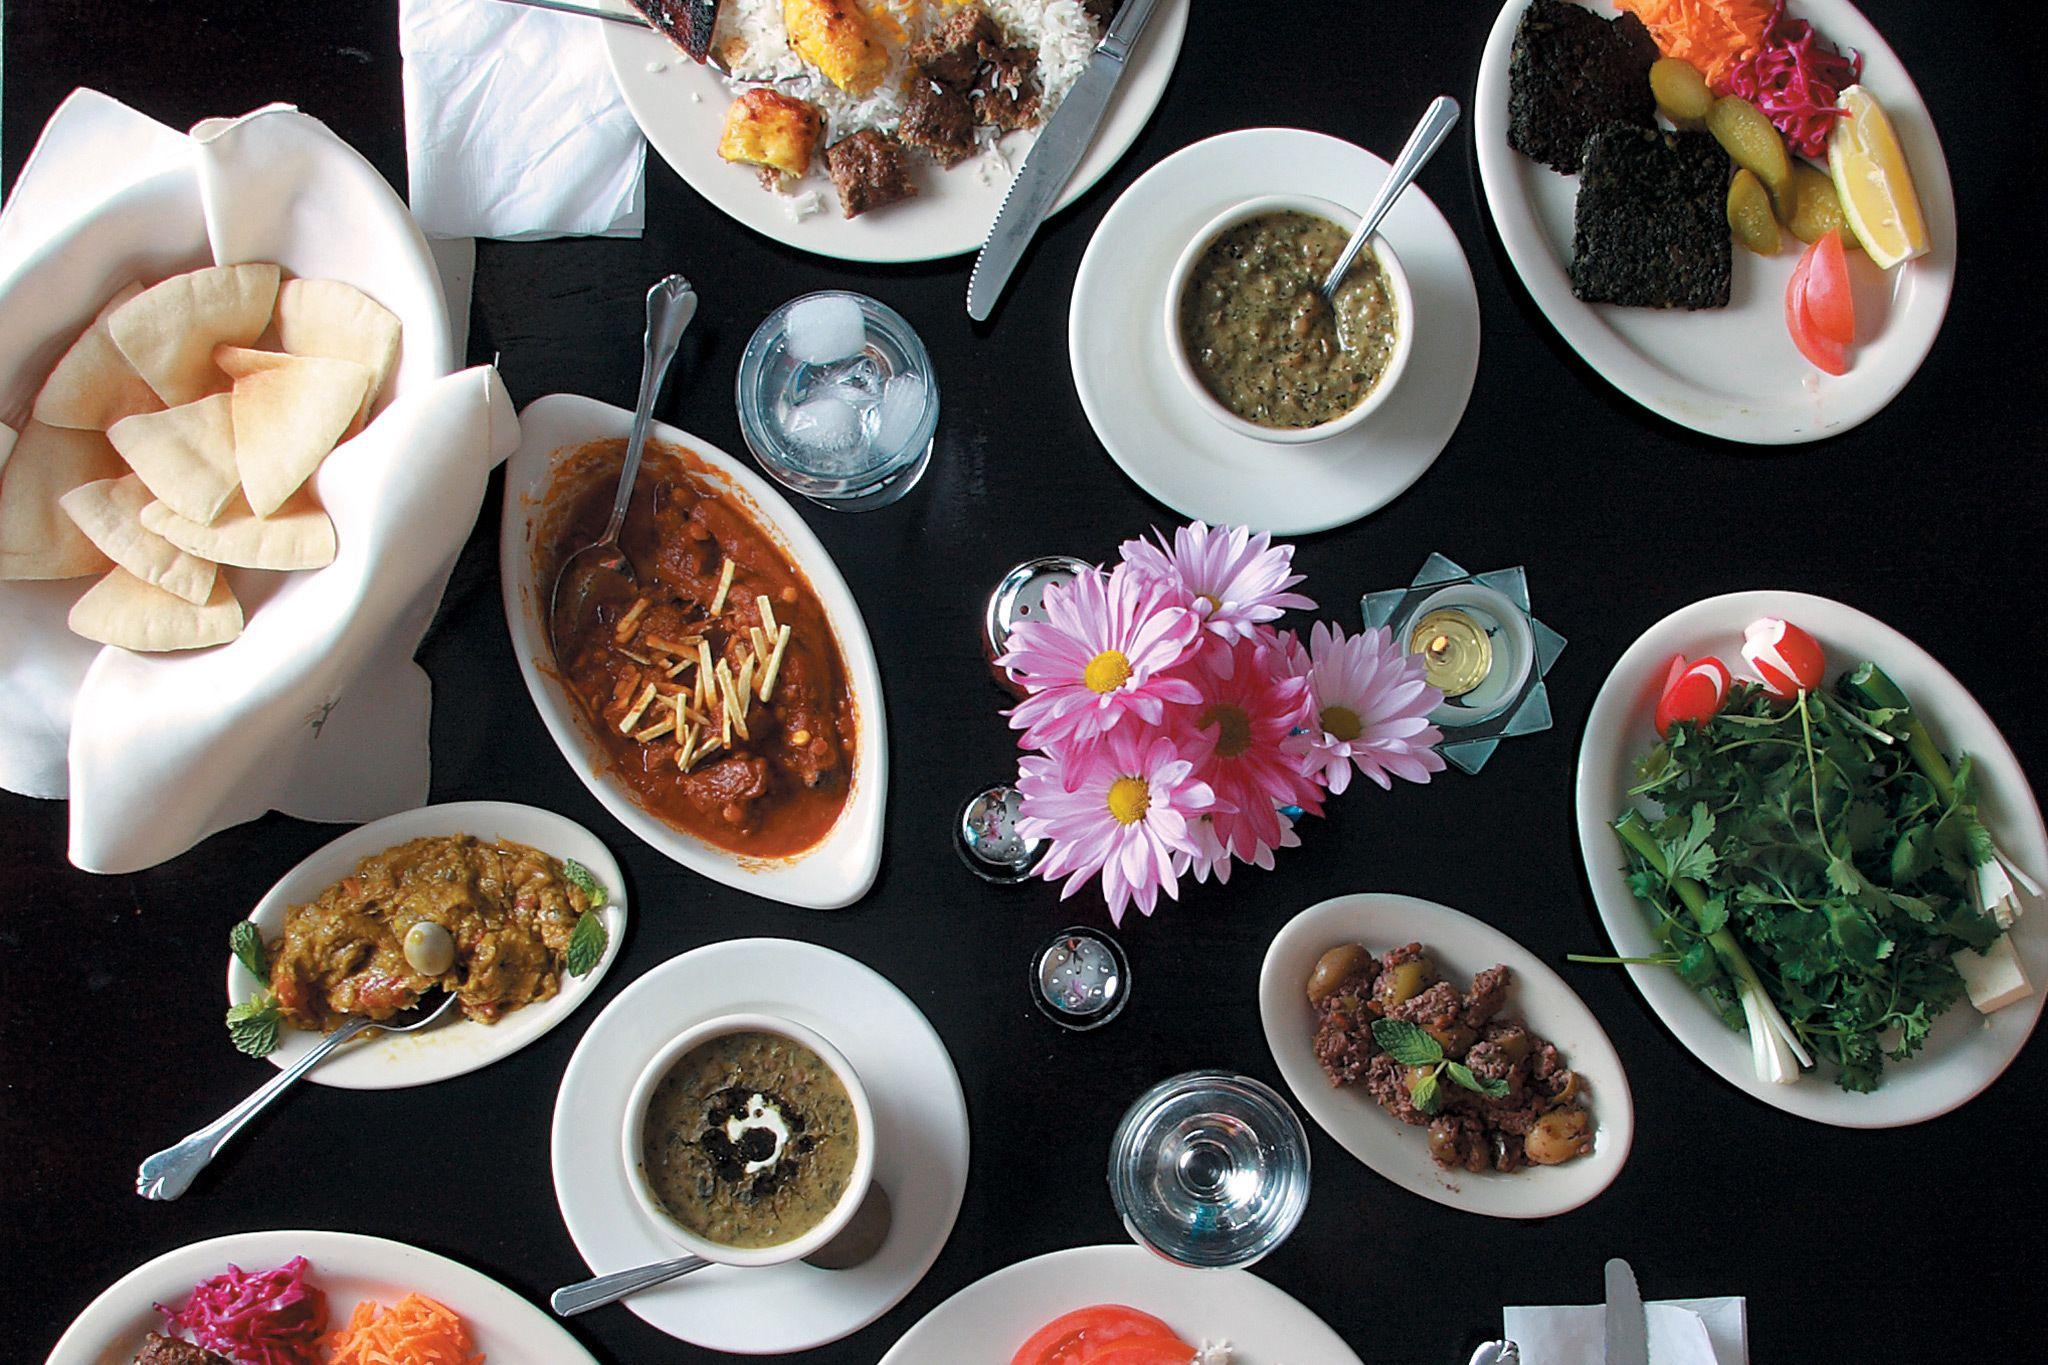 Best Middle Eastern Restaurants In Chicago For Falafel And